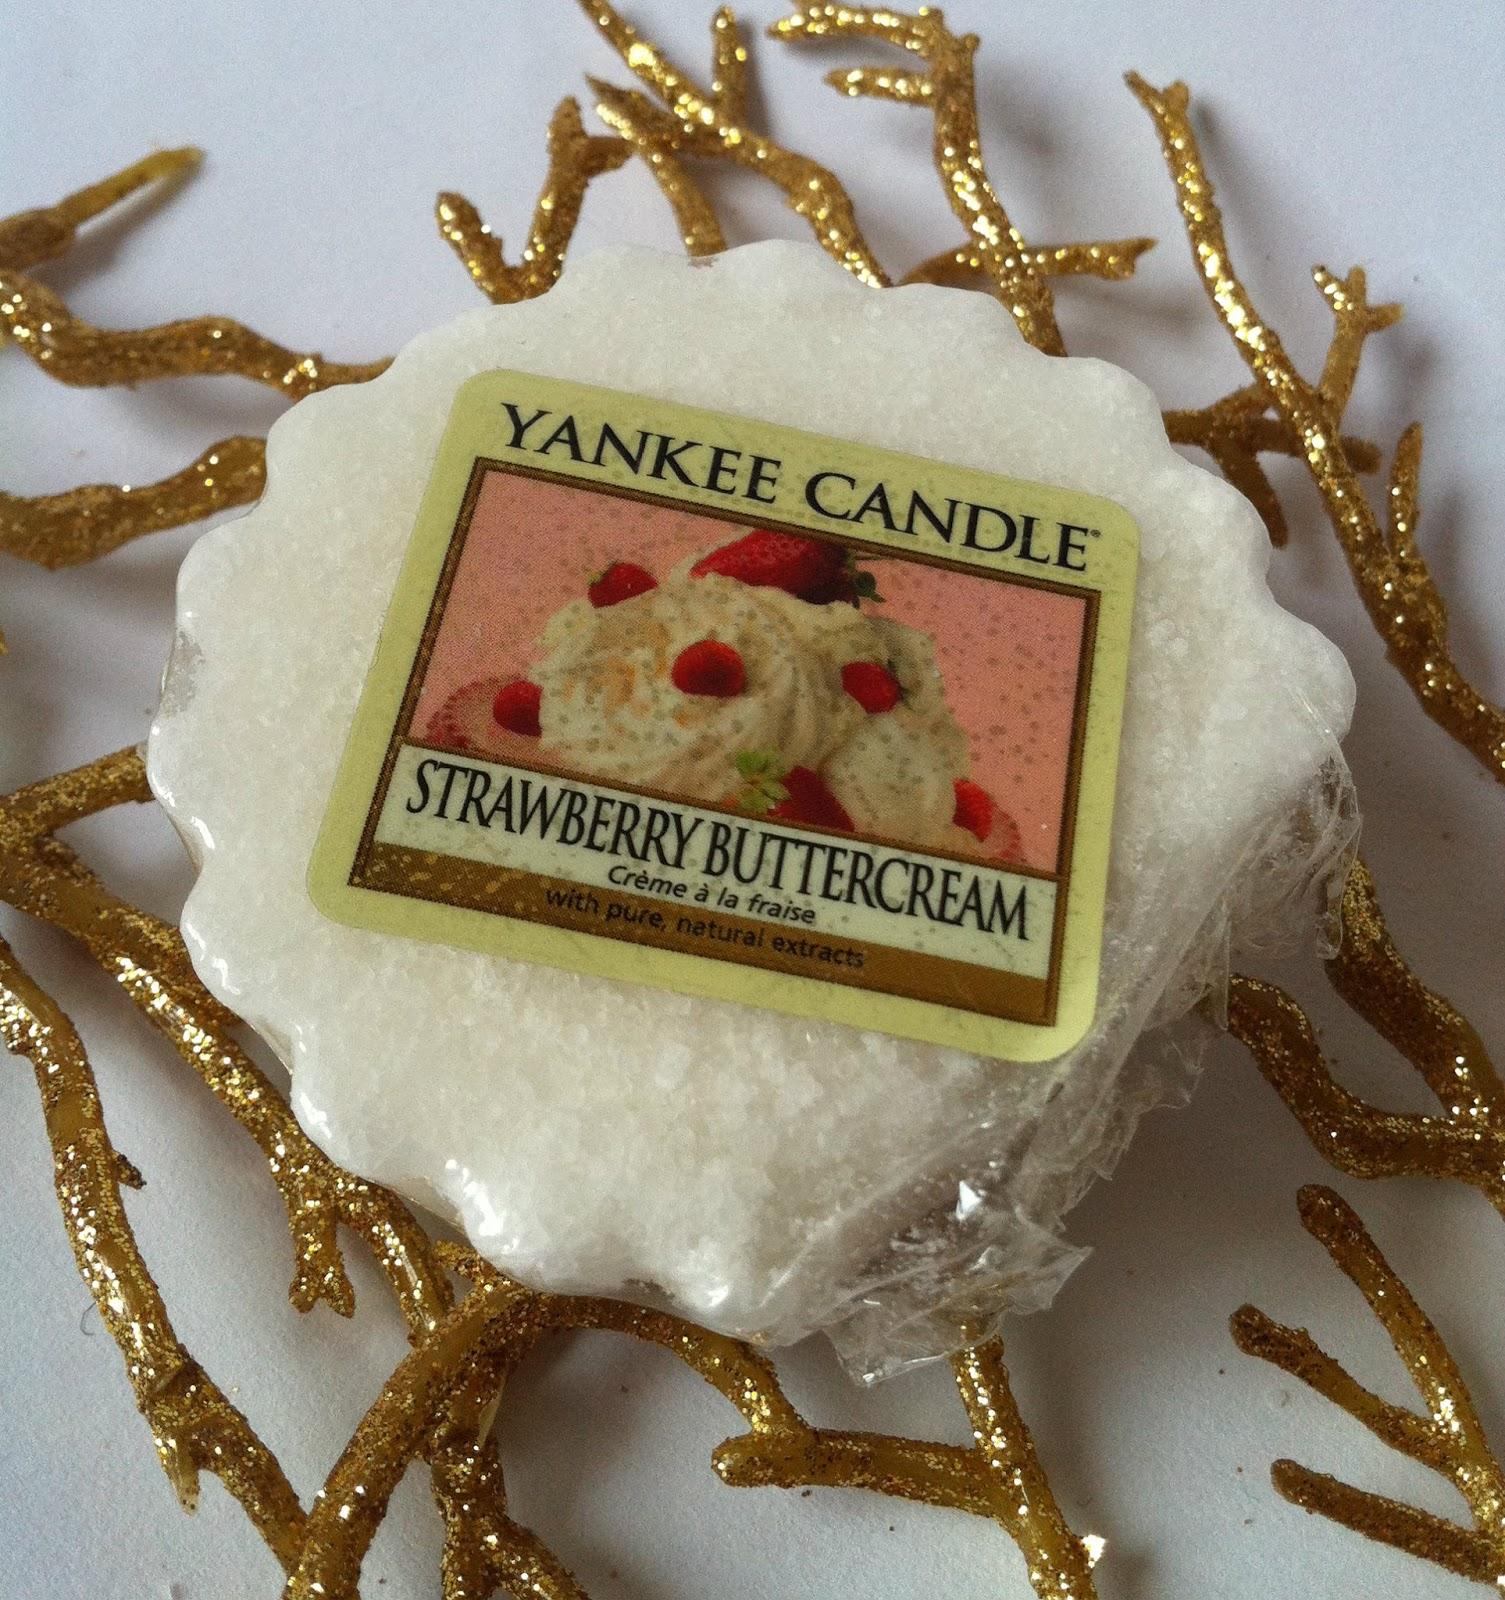 Kuszące słodkości od Yankee Candle